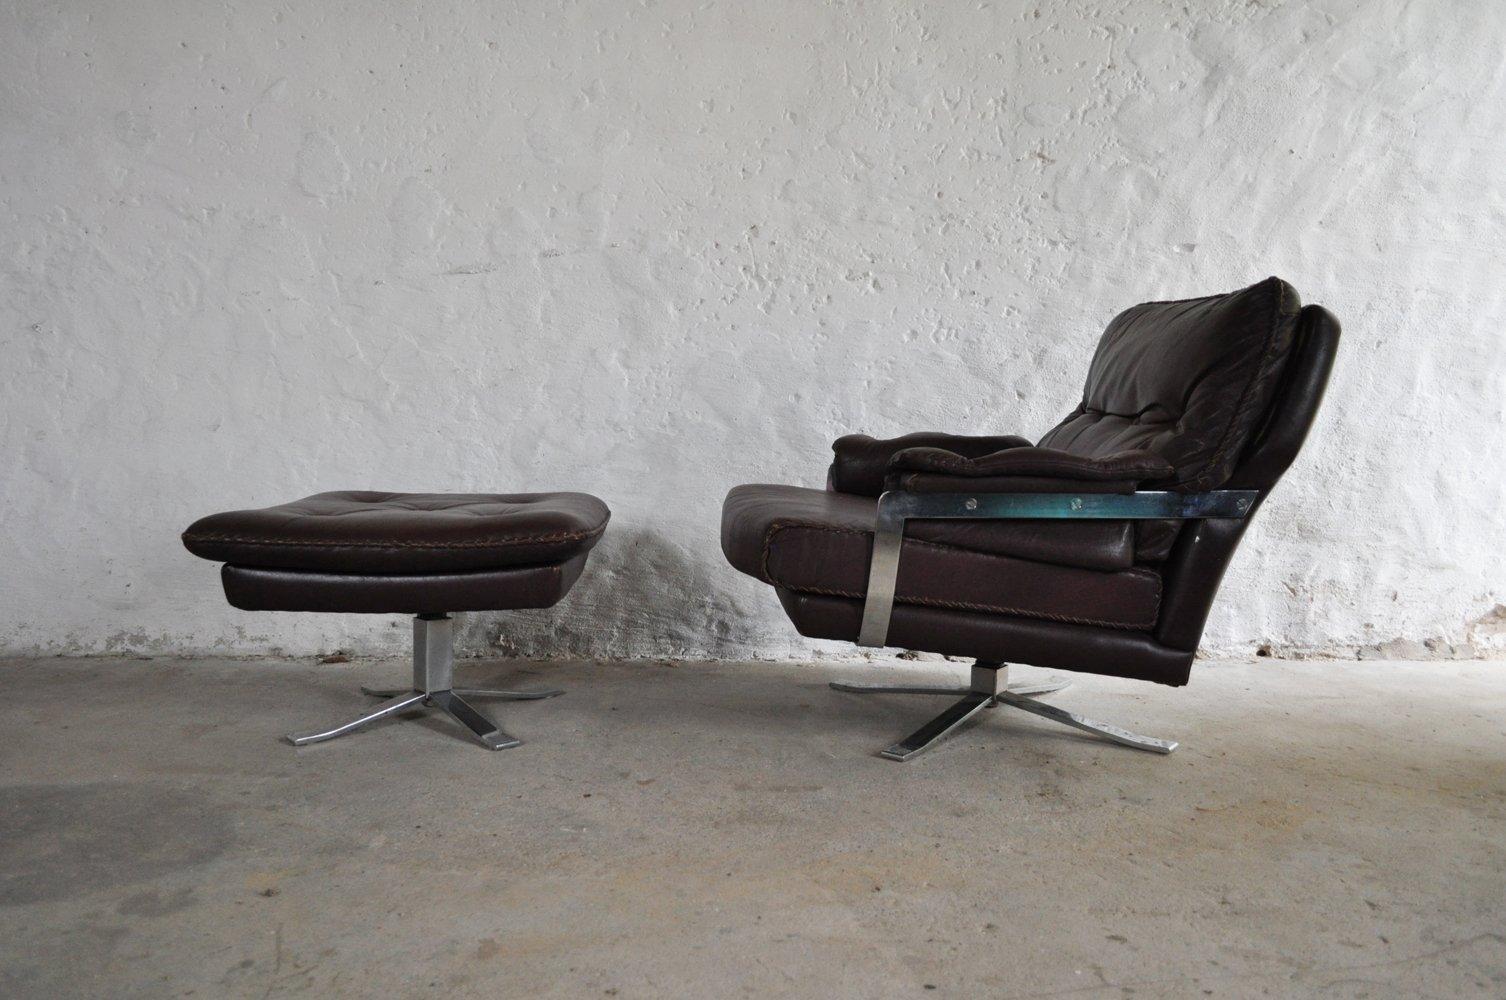 Rotbrauner vintage sessel aus leder chrom mit hocker von for Sessel mit hocker leder